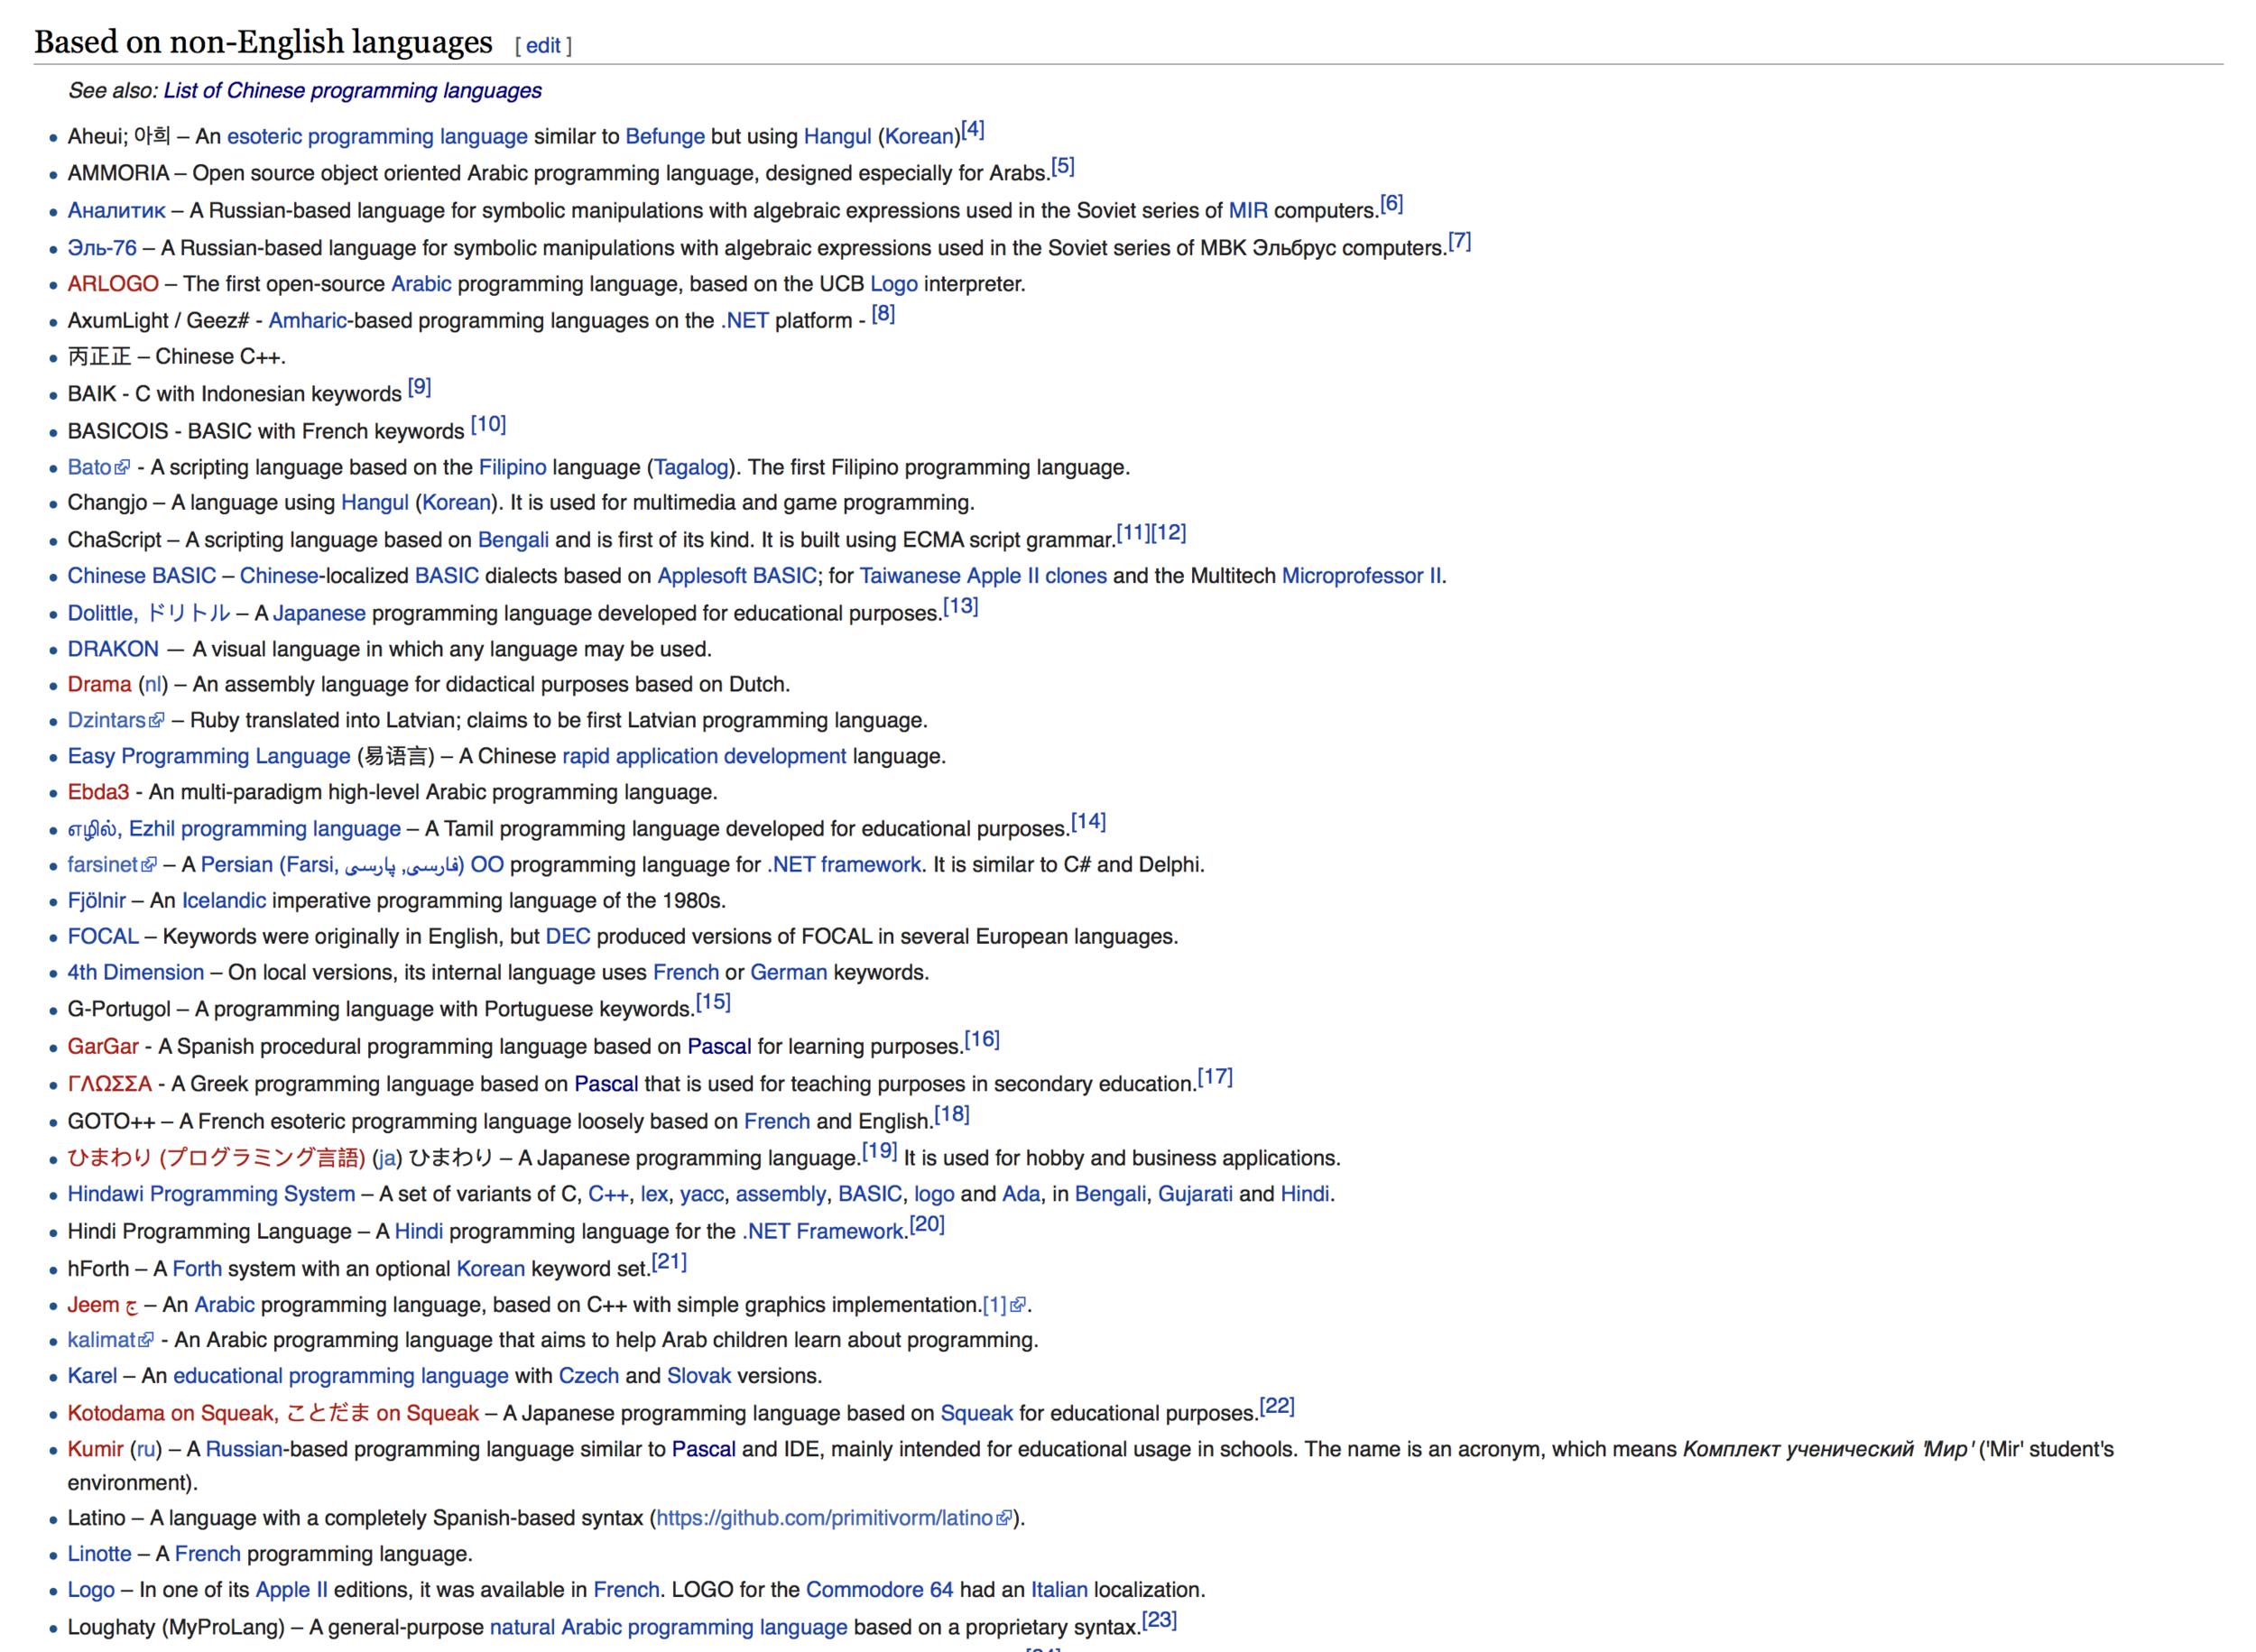 List of non-English programming languages - Wikipedia